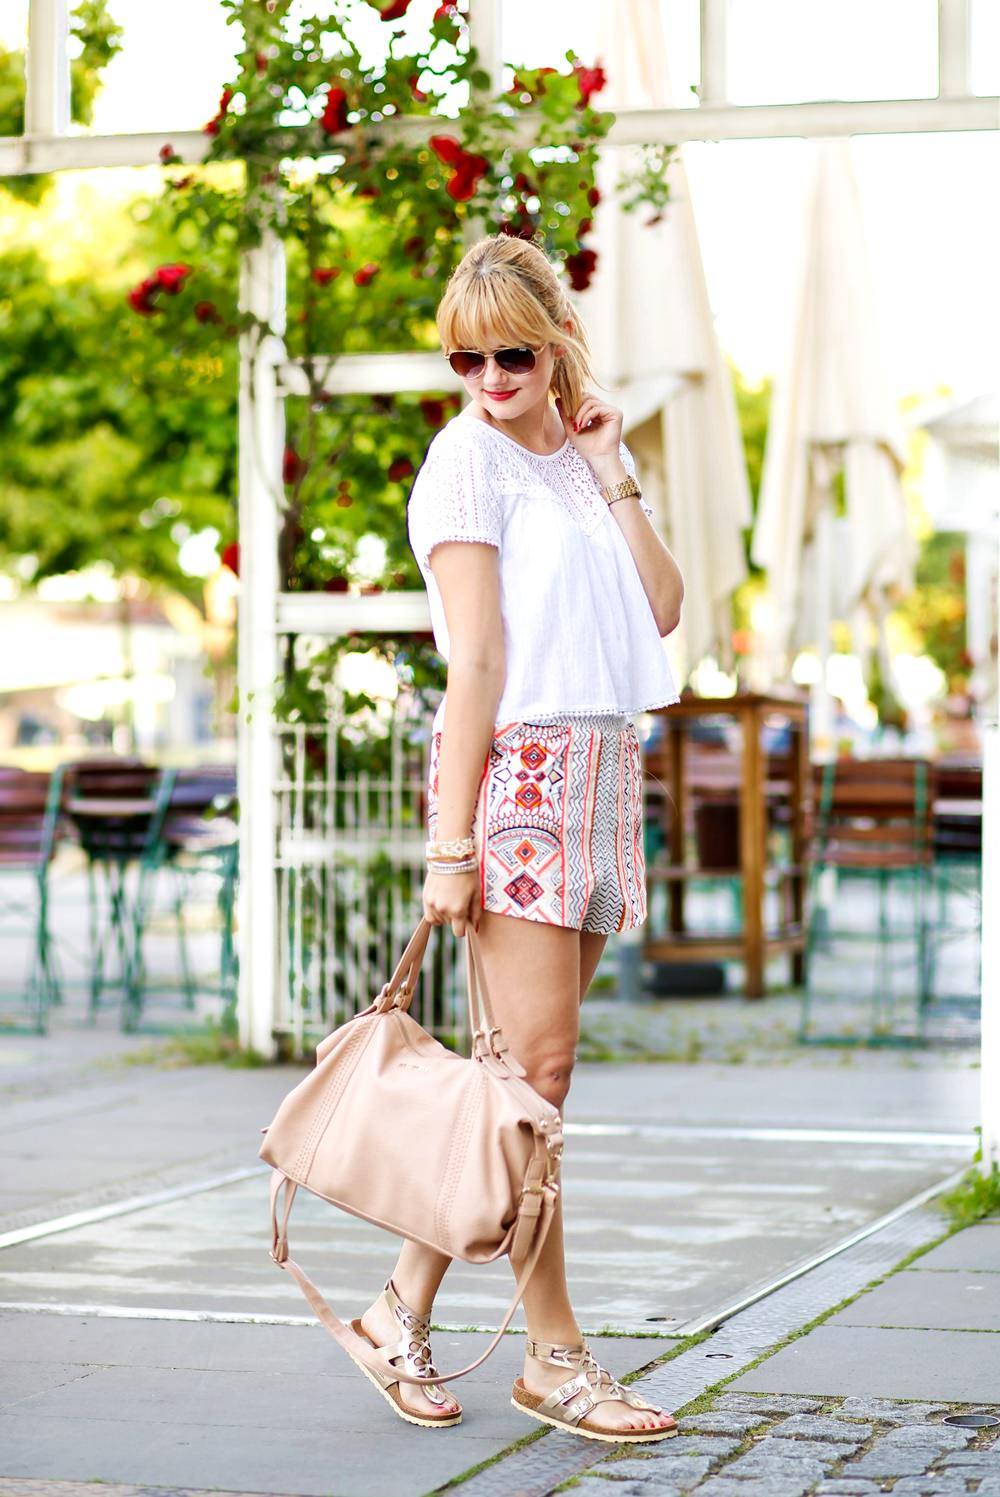 Des Belles Choses-Birkenstock Jakrta, Azteken-Shorts, weißes Spitzenshirt 1